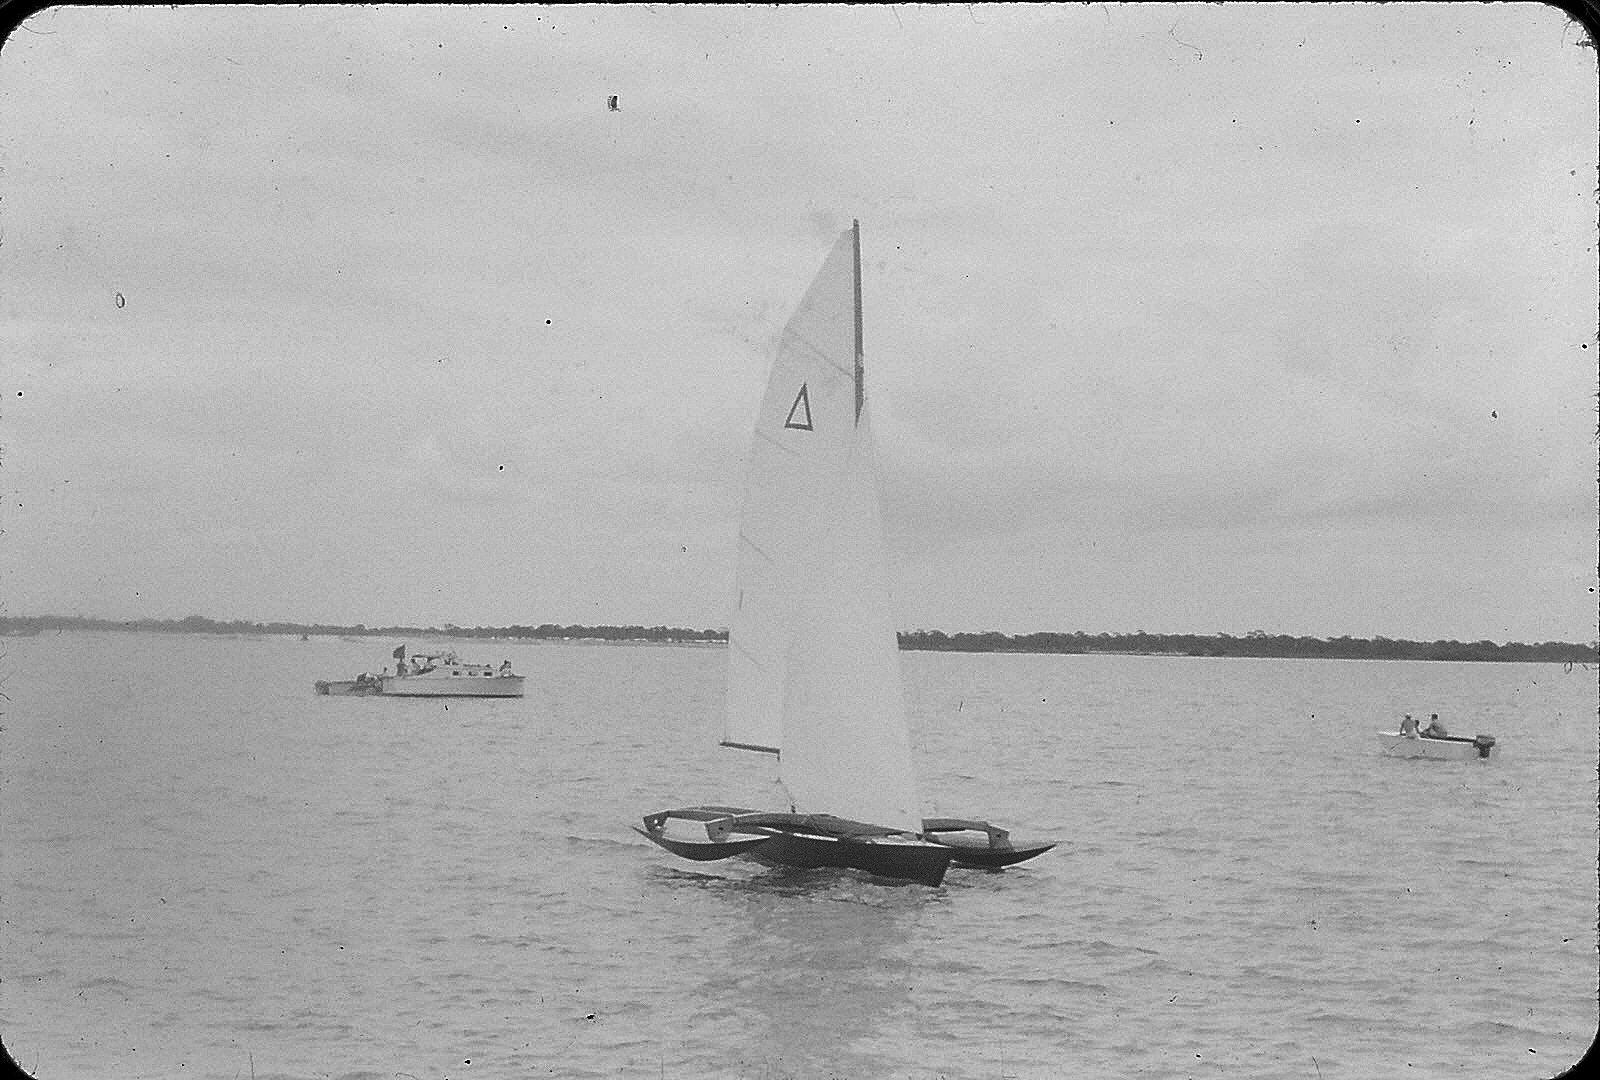 Gulfport_1959_0002b.jpg